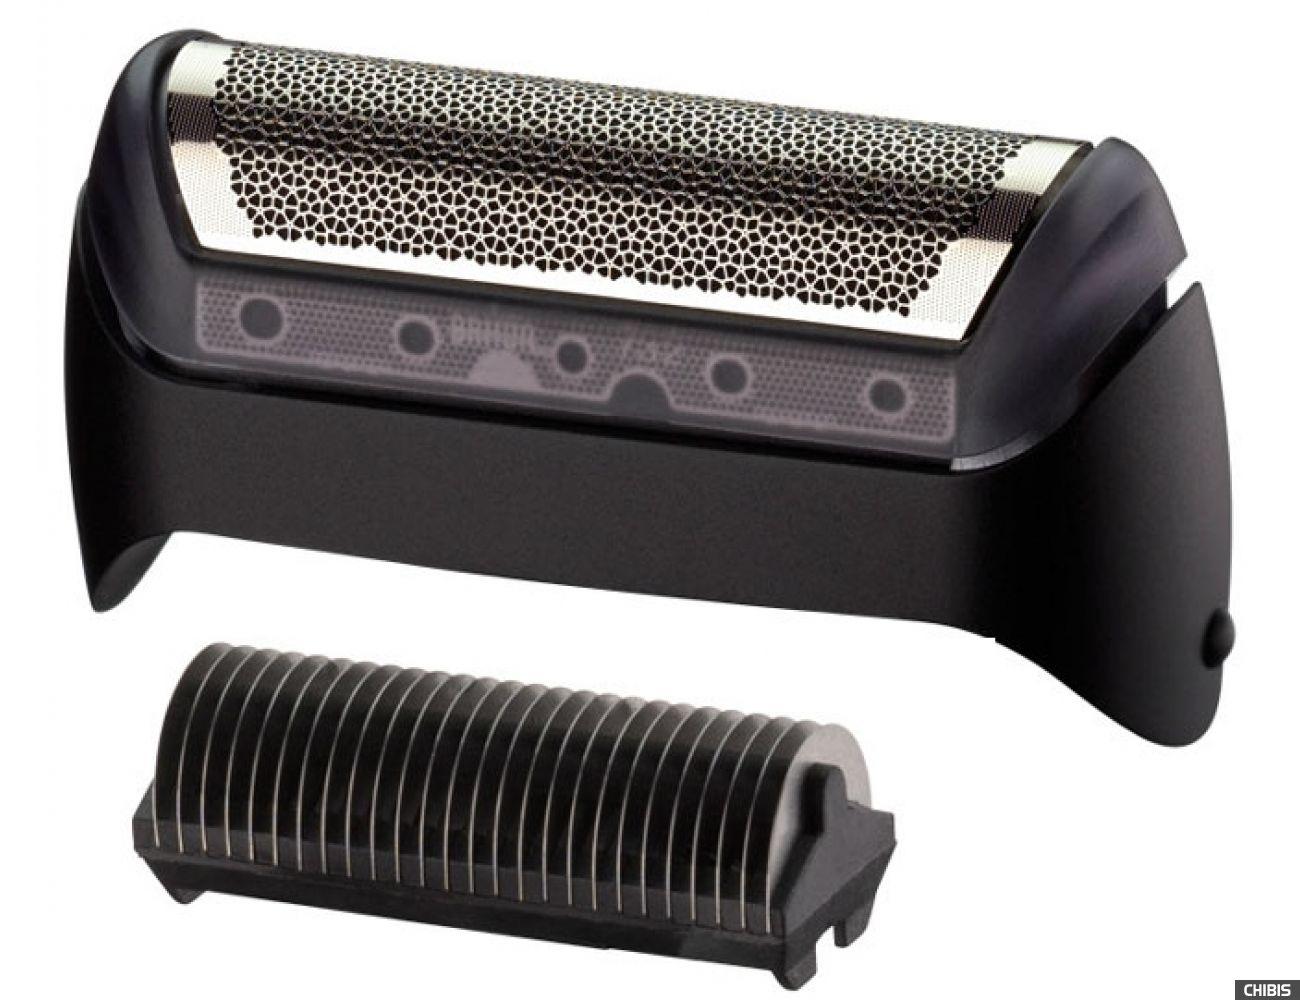 Комплект Сетка + нож для бритв Браун серии 1 фриконтрол, крузер, совместимый